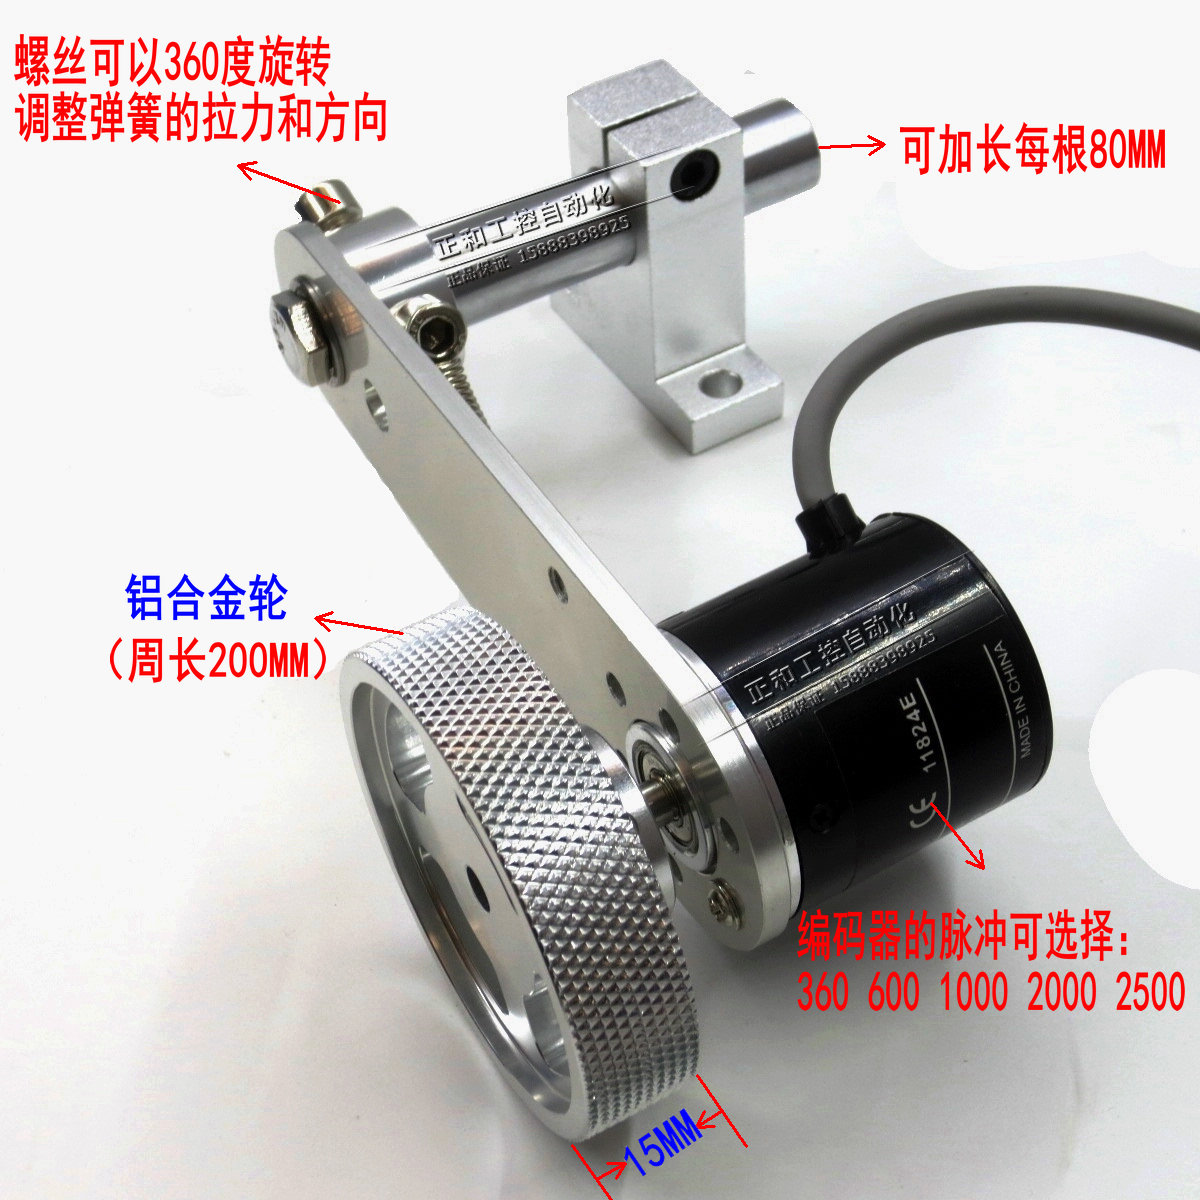 цена на High Precision Meter, Rotary Encoder, Meter Wheel, Anti-skid Bracket, Encoder, Meter, Meter, Wheel Set.